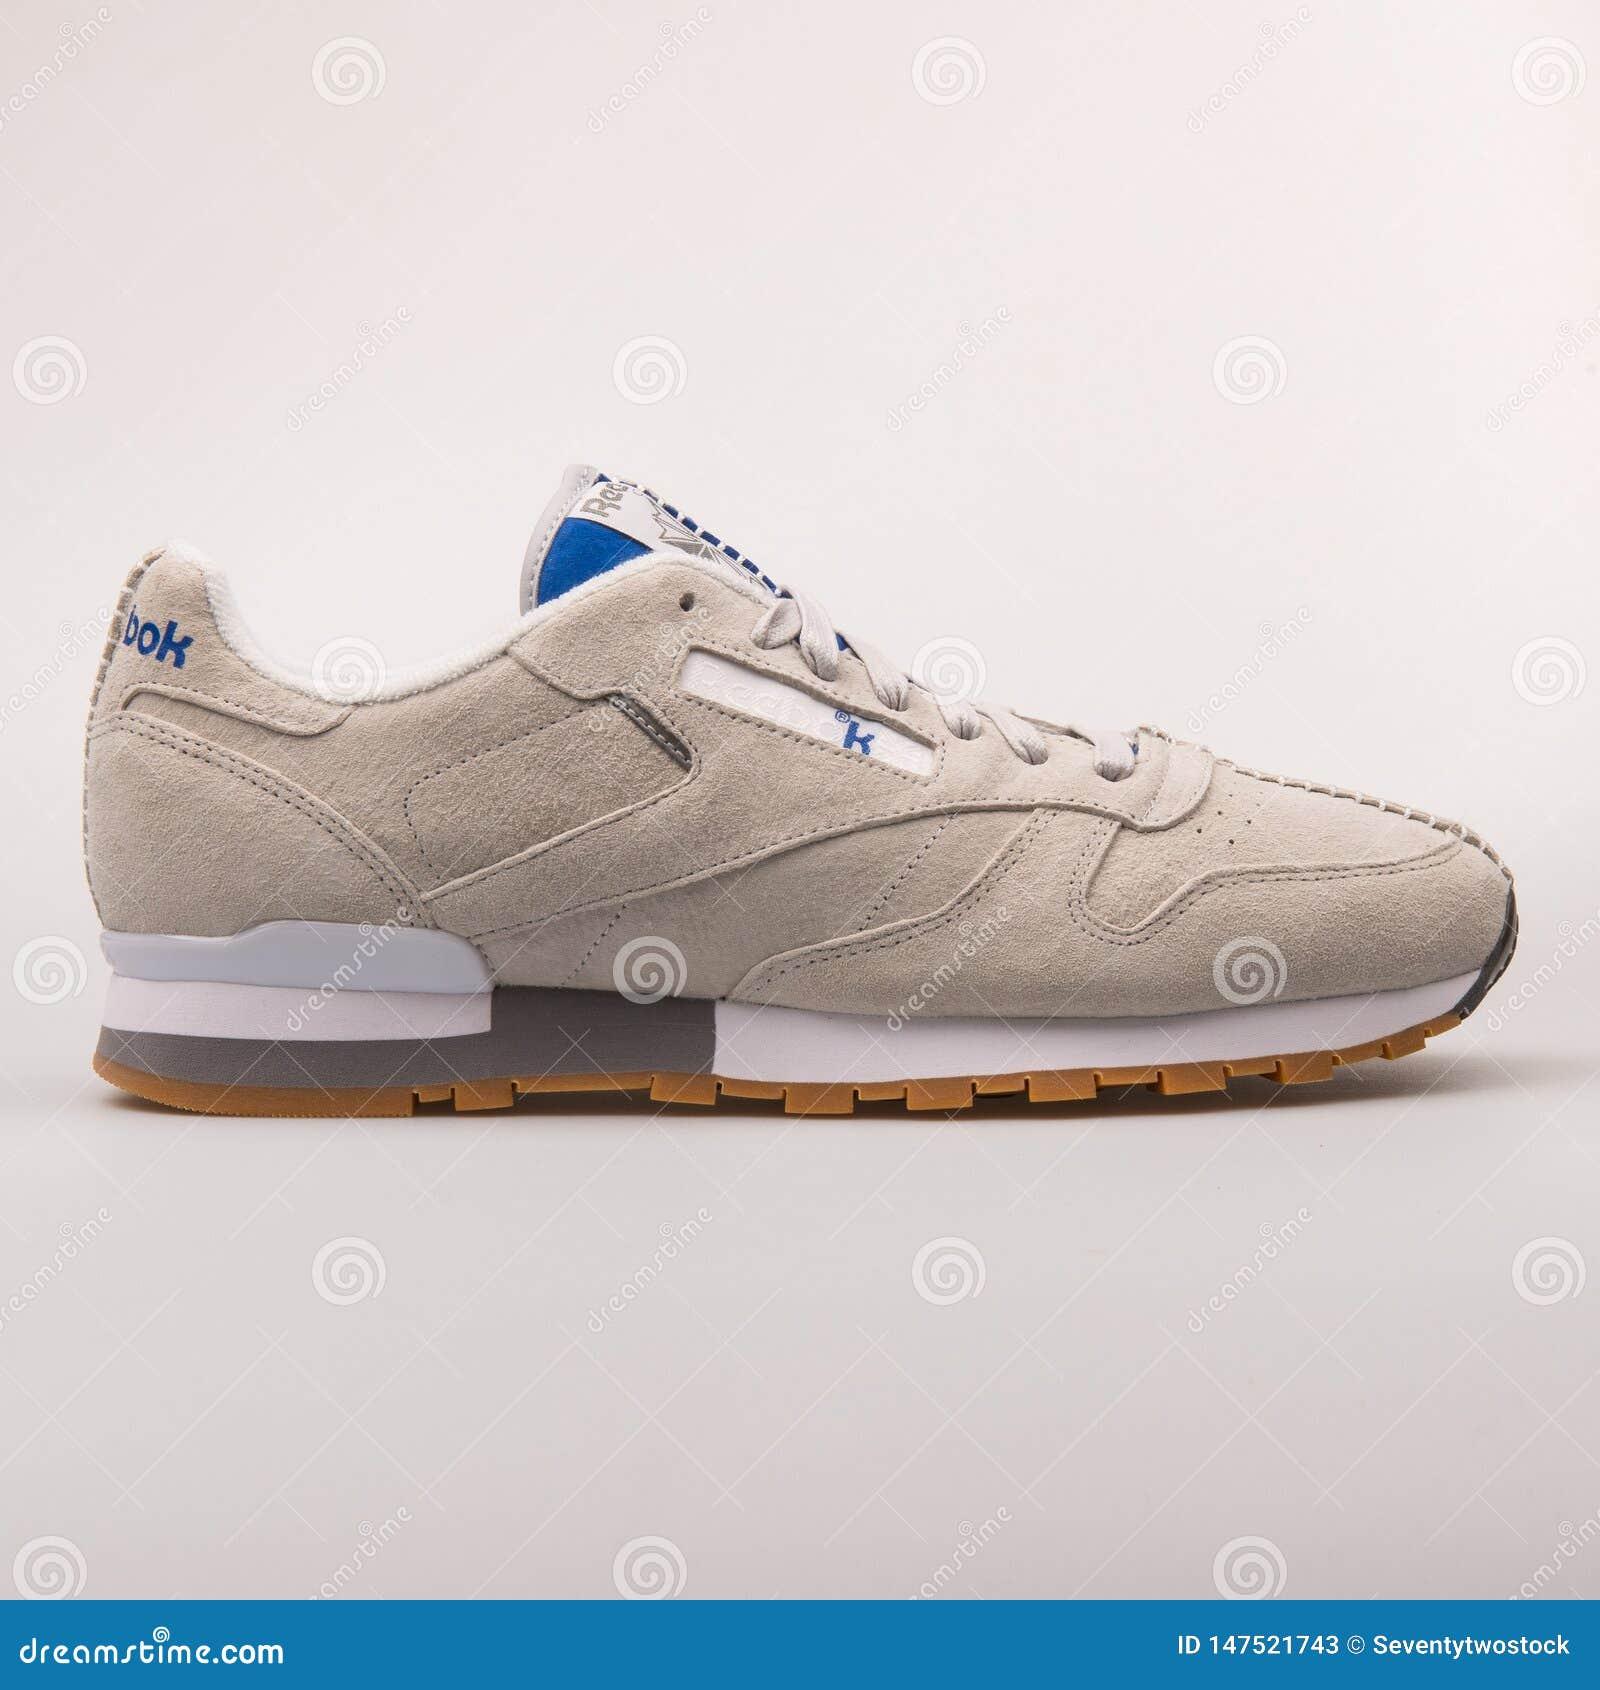 28489d03 Reebok Classic Leather KLSP Grey Sneaker Editorial Stock Photo ...